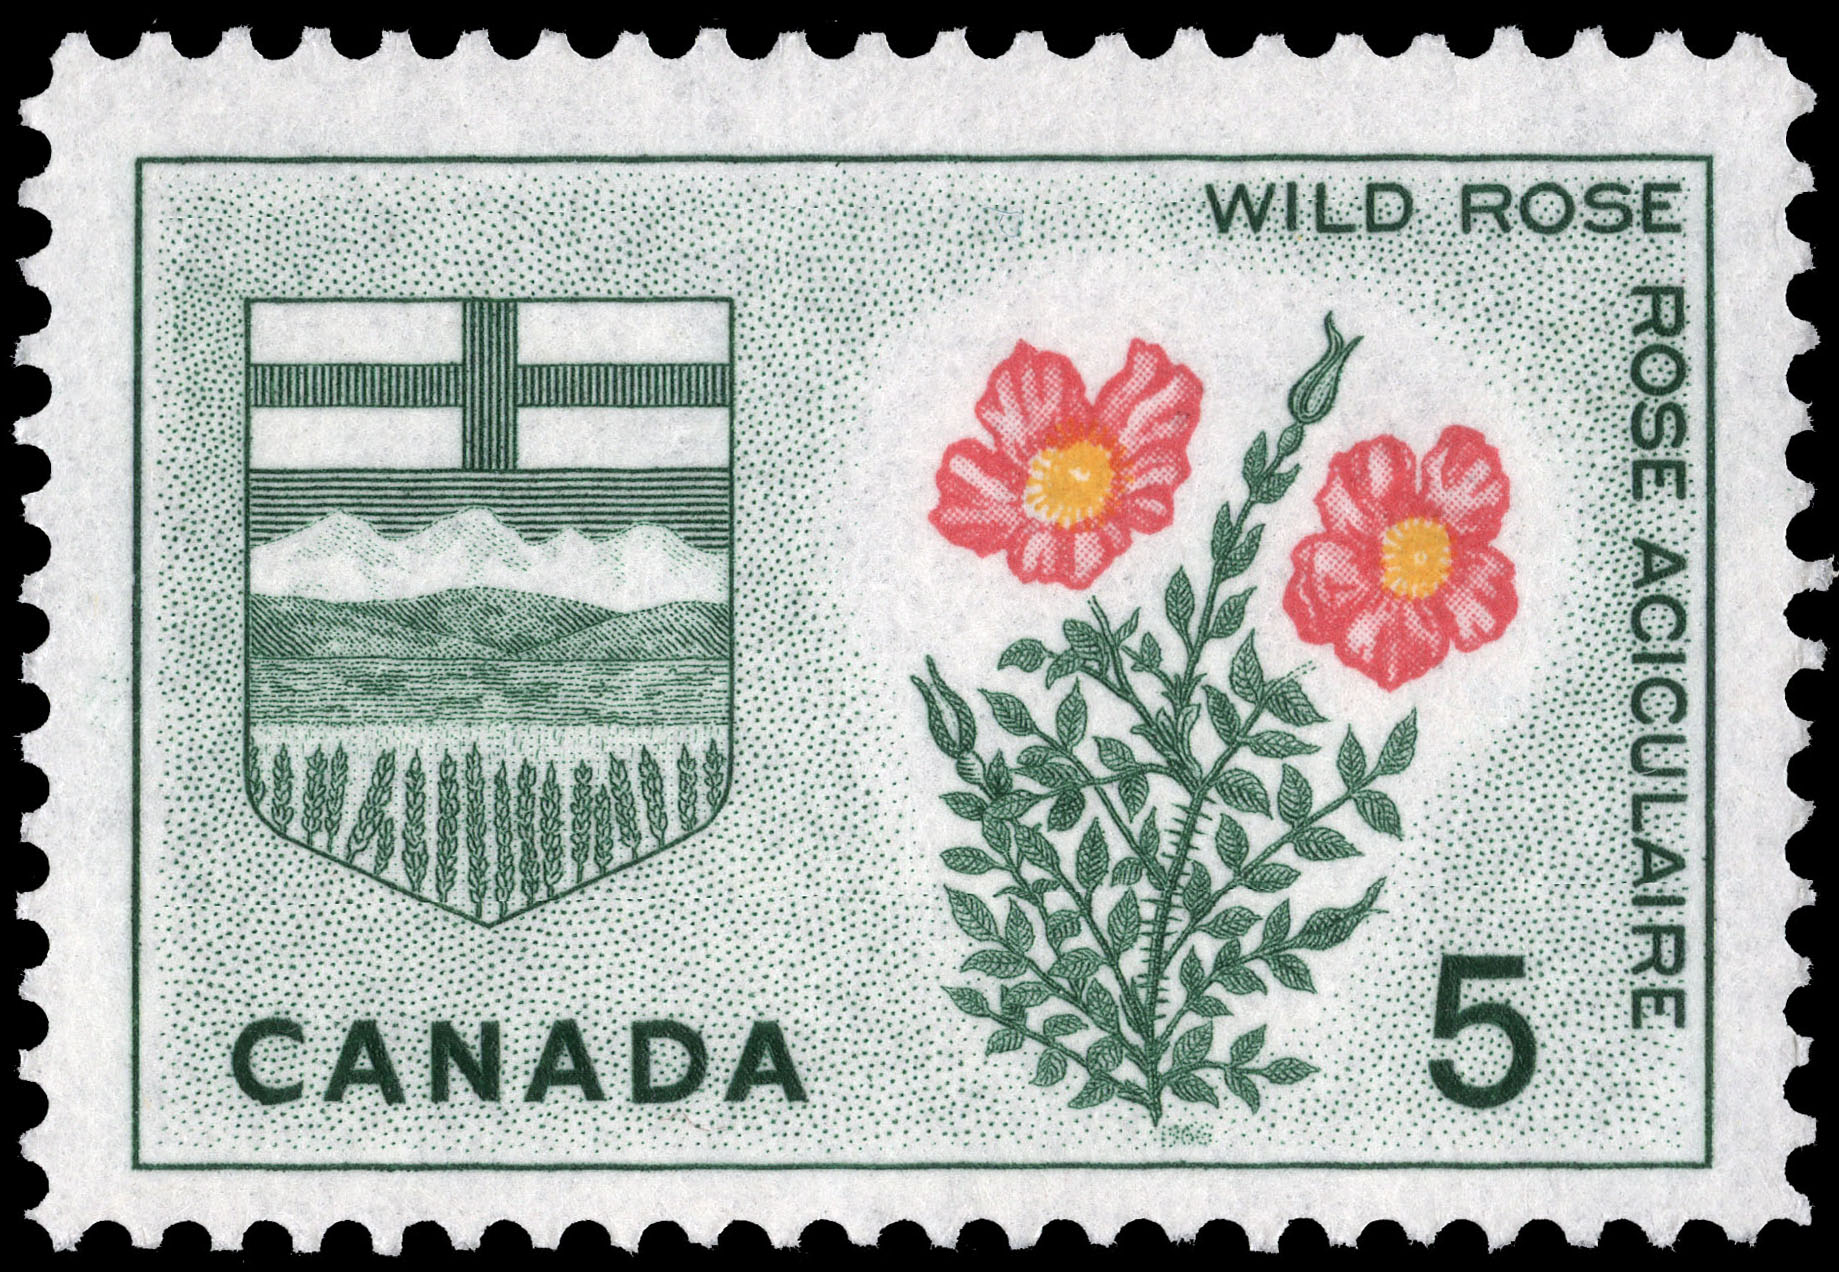 Wild Rose, Alberta Canada Postage Stamp